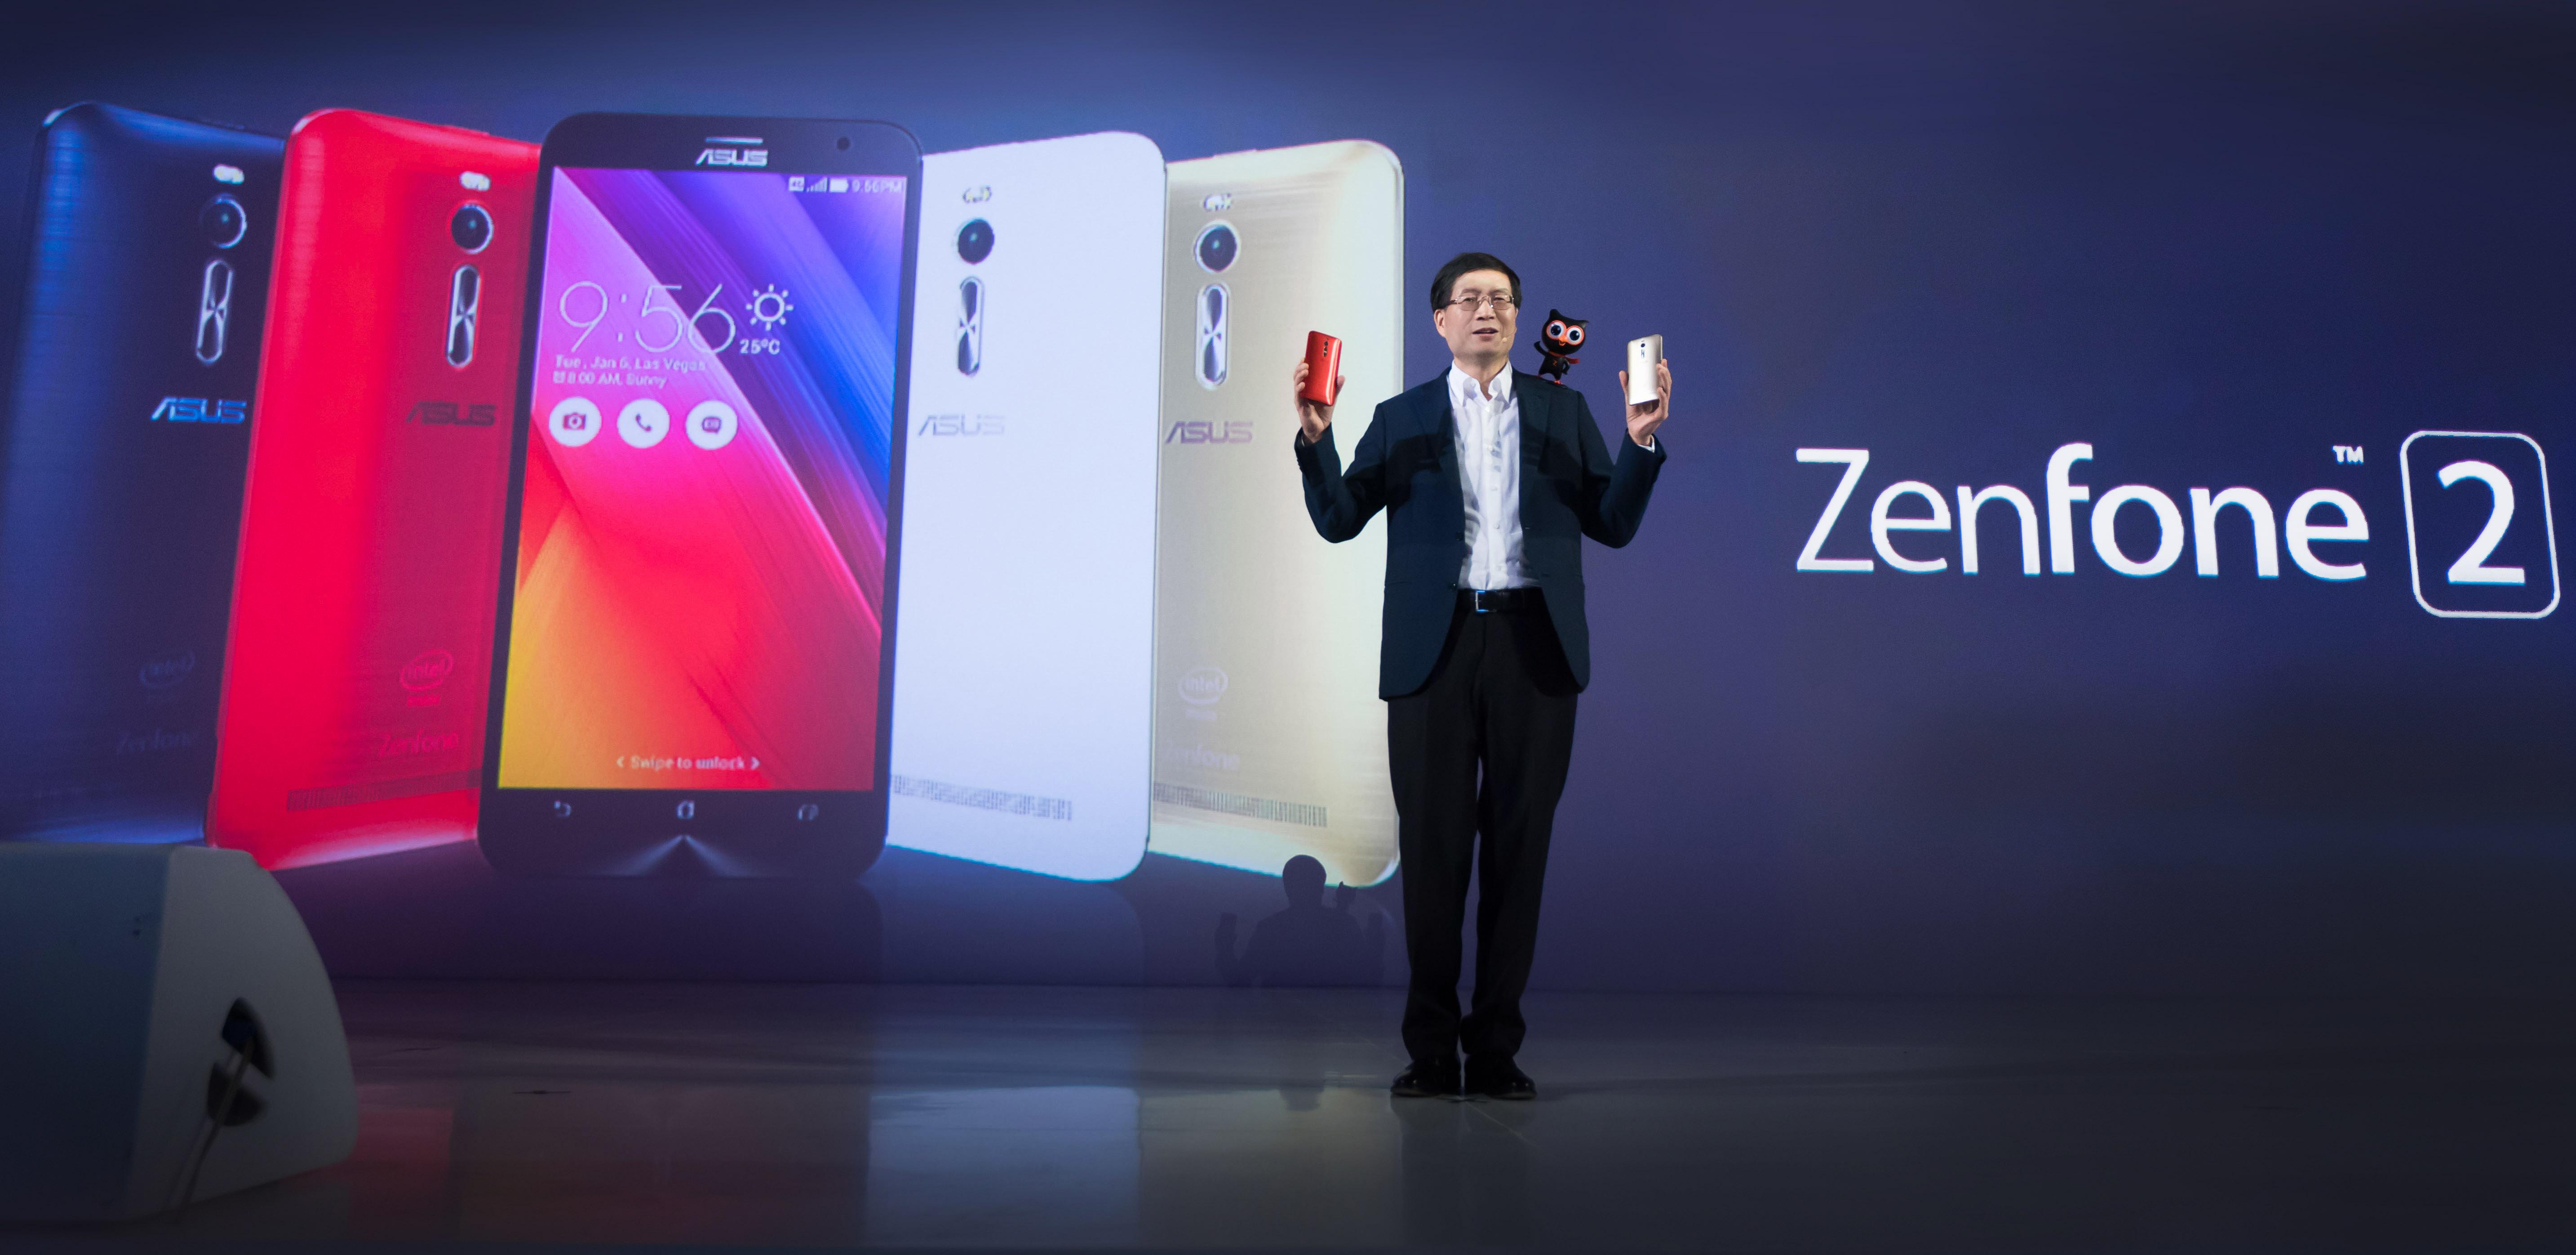 ASUS CEO Jerry Shen announces launch of ZenFone 2 for Southeast Asia markets.